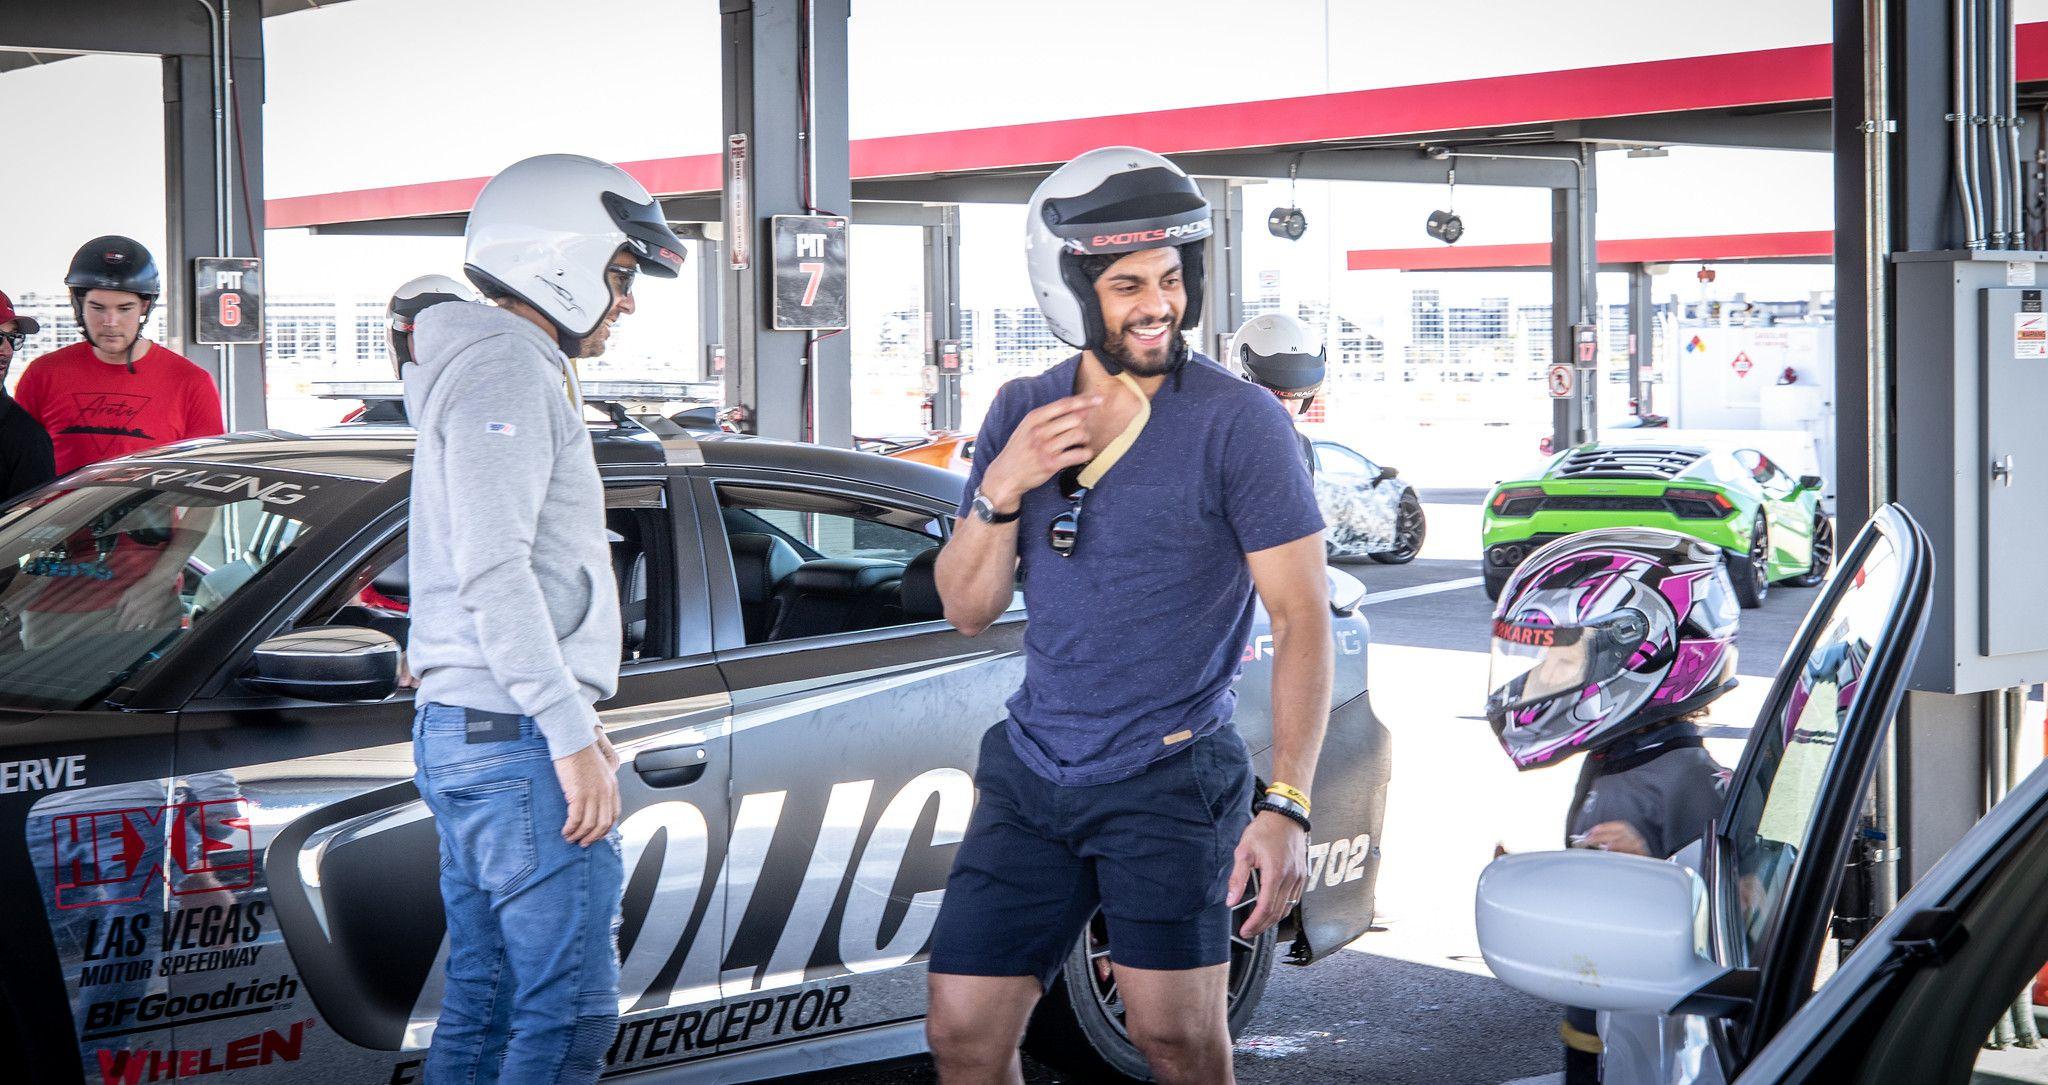 Celebrity Sighting Vegas Golden Knights Drive Supercars Go Karts At Exotics Racing Go Kart Vegas Golden Knights Super Cars